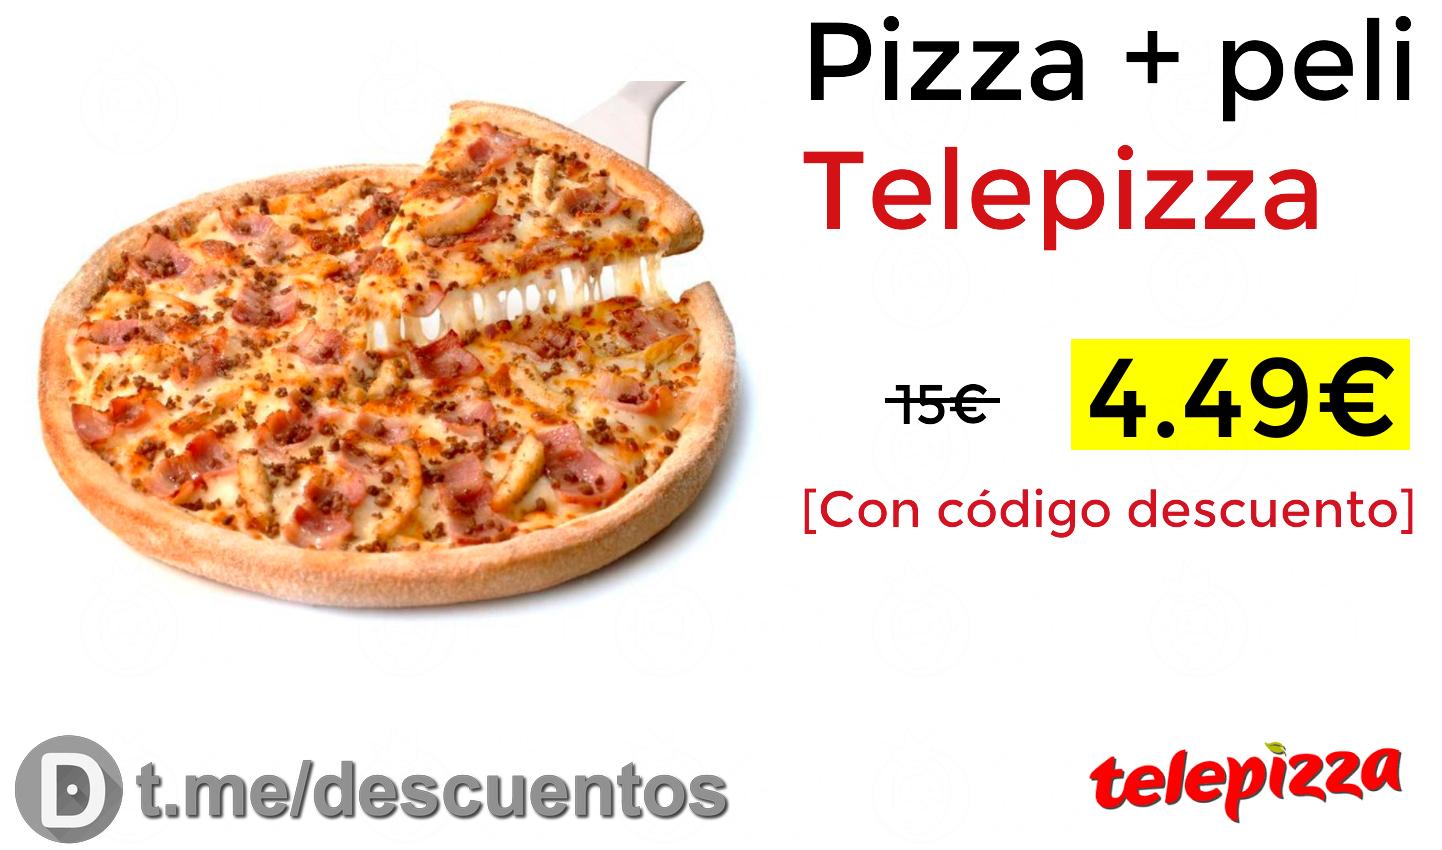 Telepizza mediana + pelis por 4€